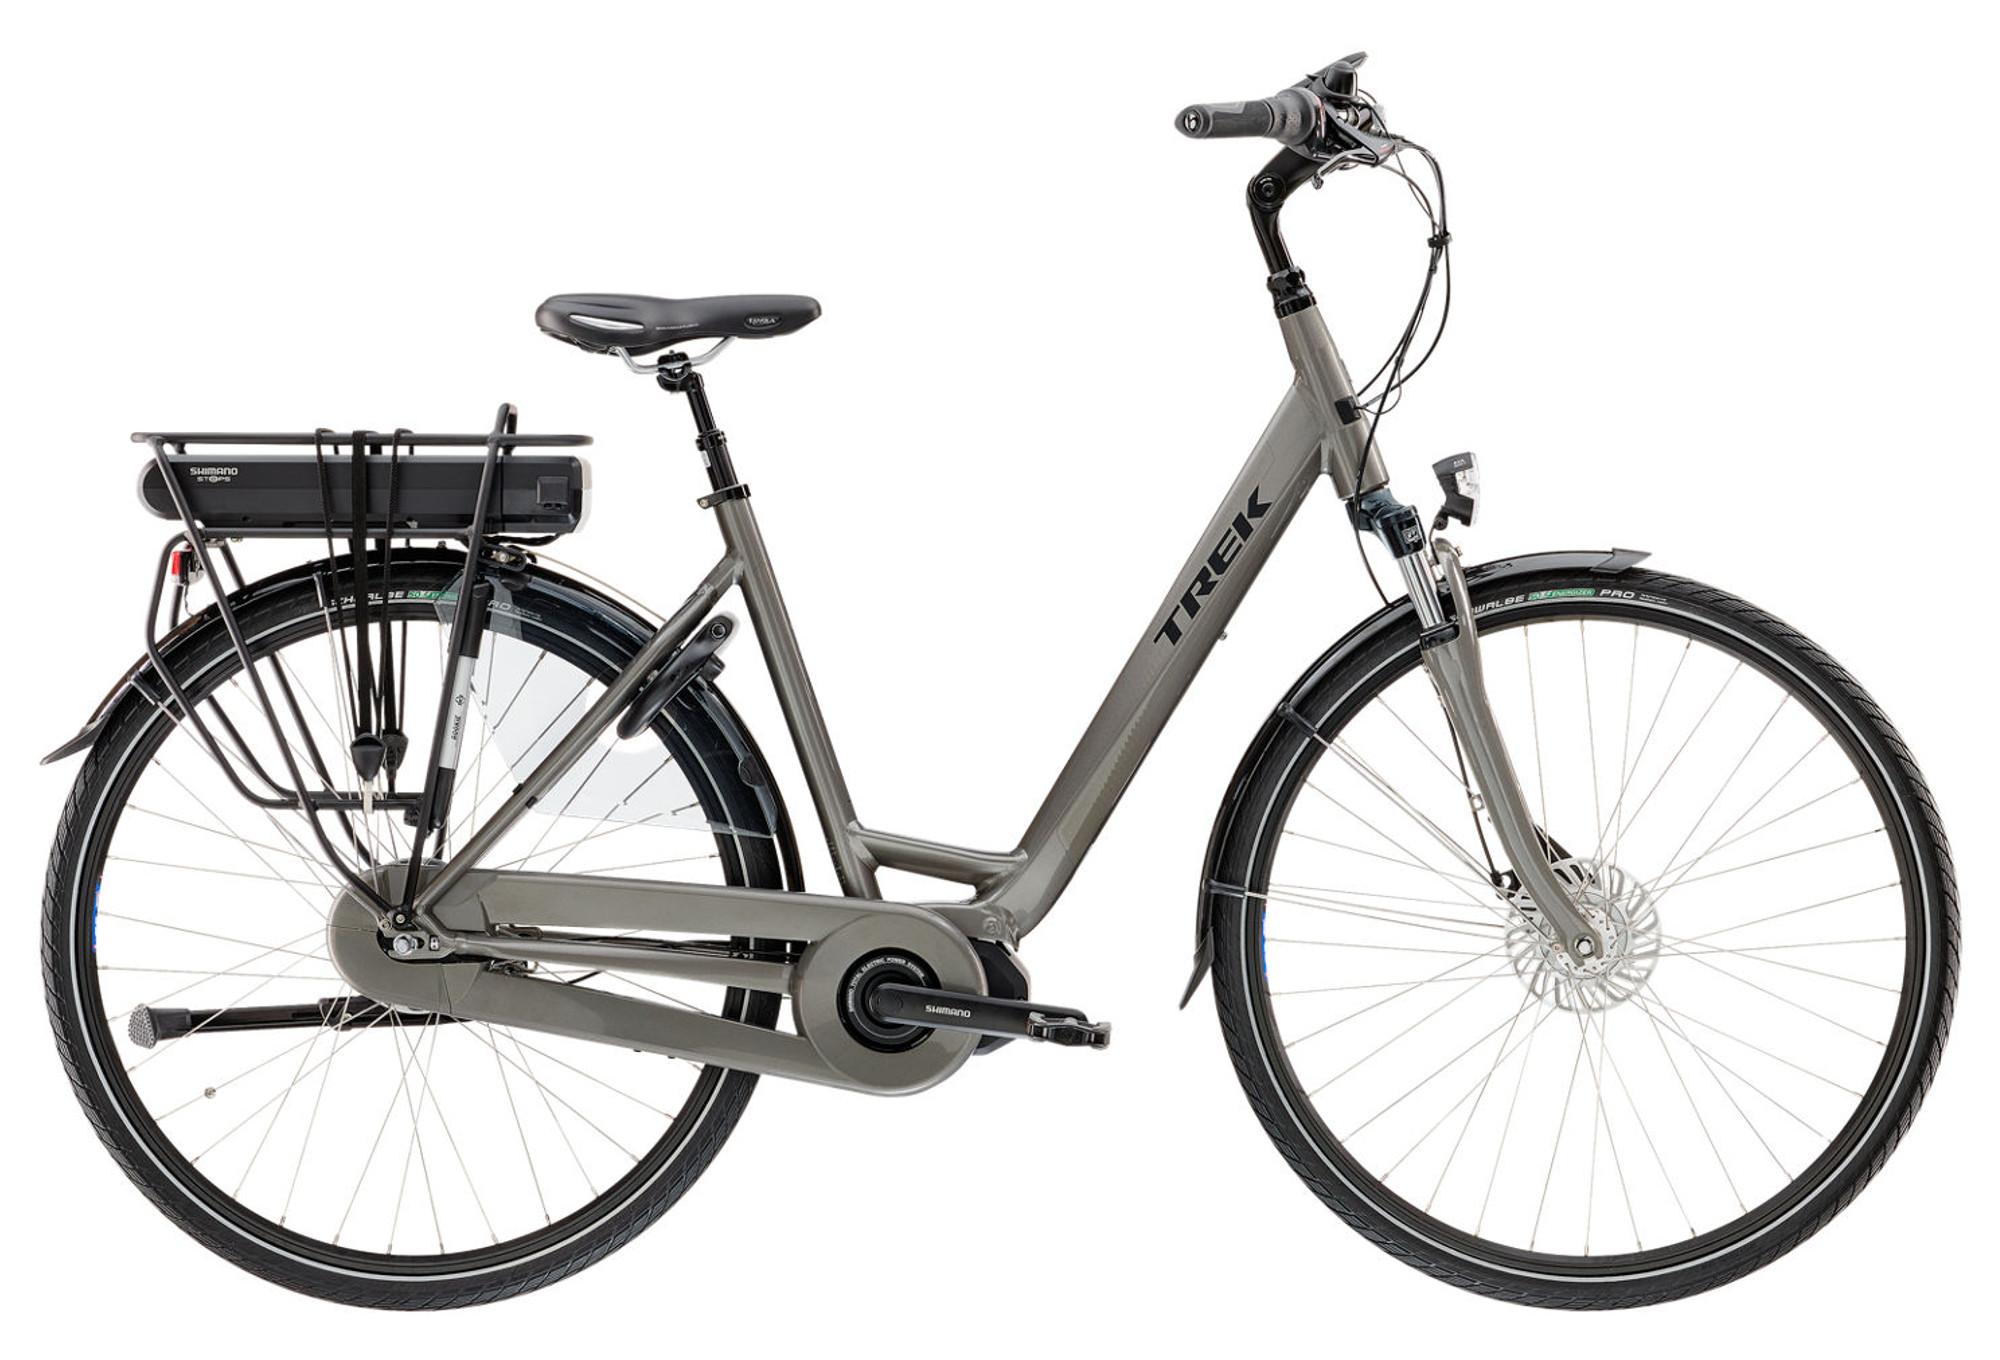 trek lm400 2017 e city bike shimano nexus 7 speed. Black Bedroom Furniture Sets. Home Design Ideas